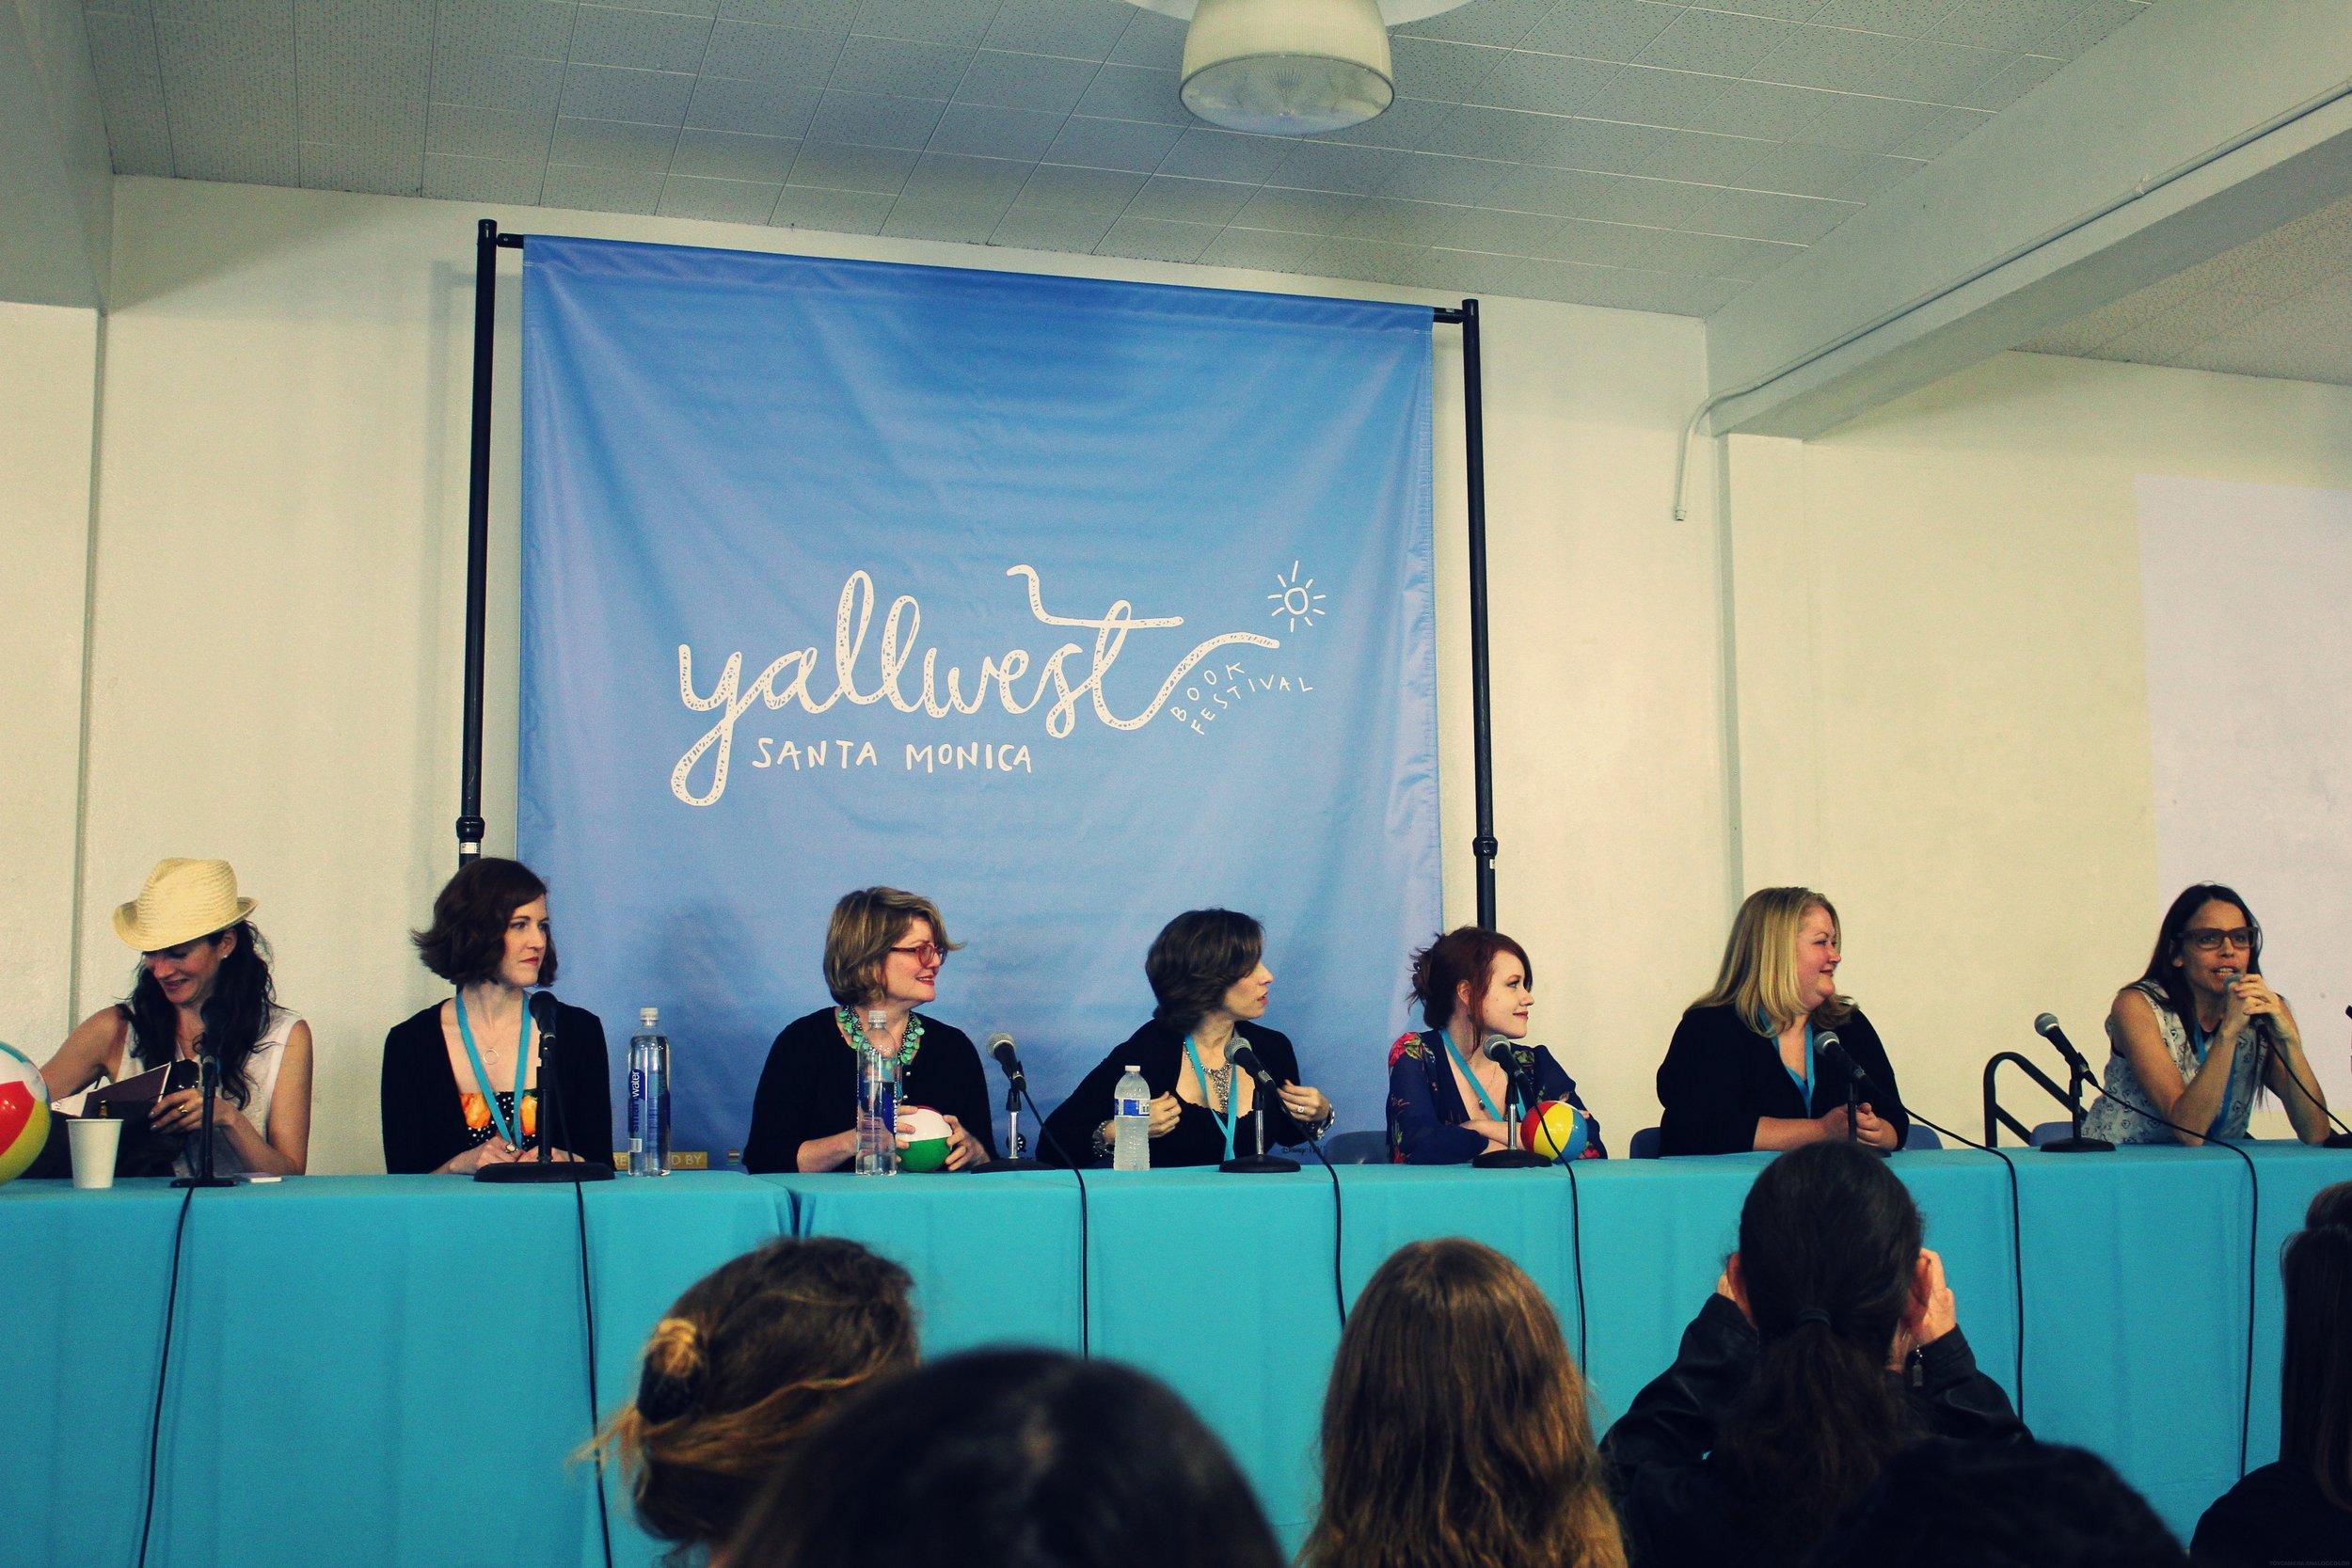 from left to right: Lauren Oliver, Stephanie Perkins, Kami Garcia, Richelle Mead, Rachel Cohn, Margaret Stohl (mod)